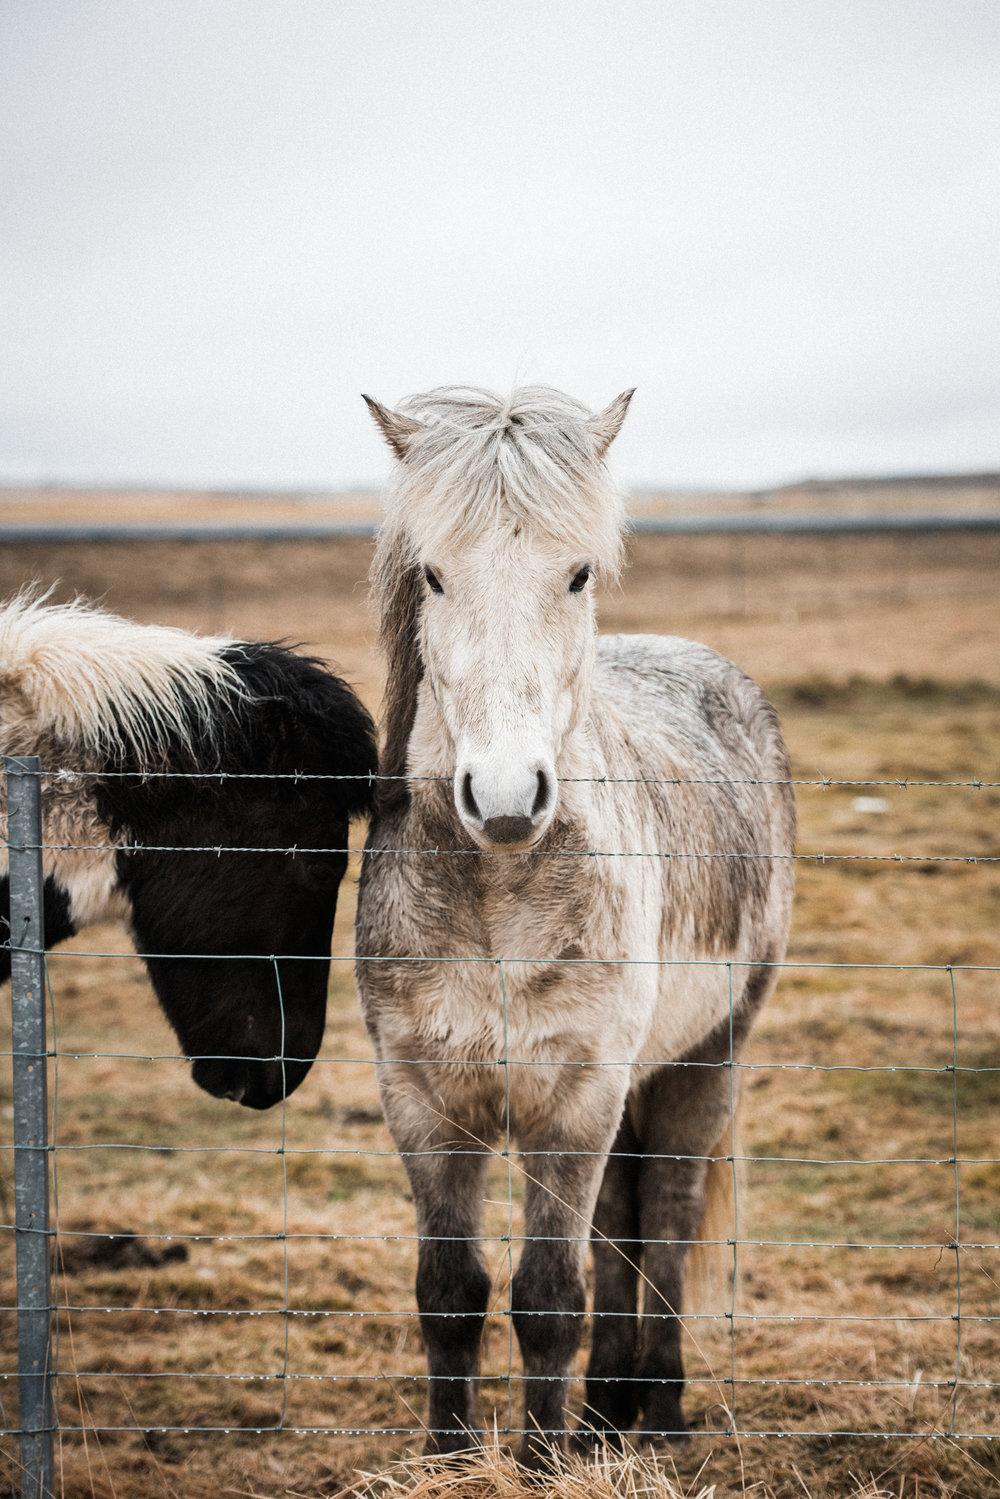 ICELAND_WOMAN_PHOTOGRAPHER_TARASHUPE_OUTDOOR_PHOTOGRAPHY_004.jpg